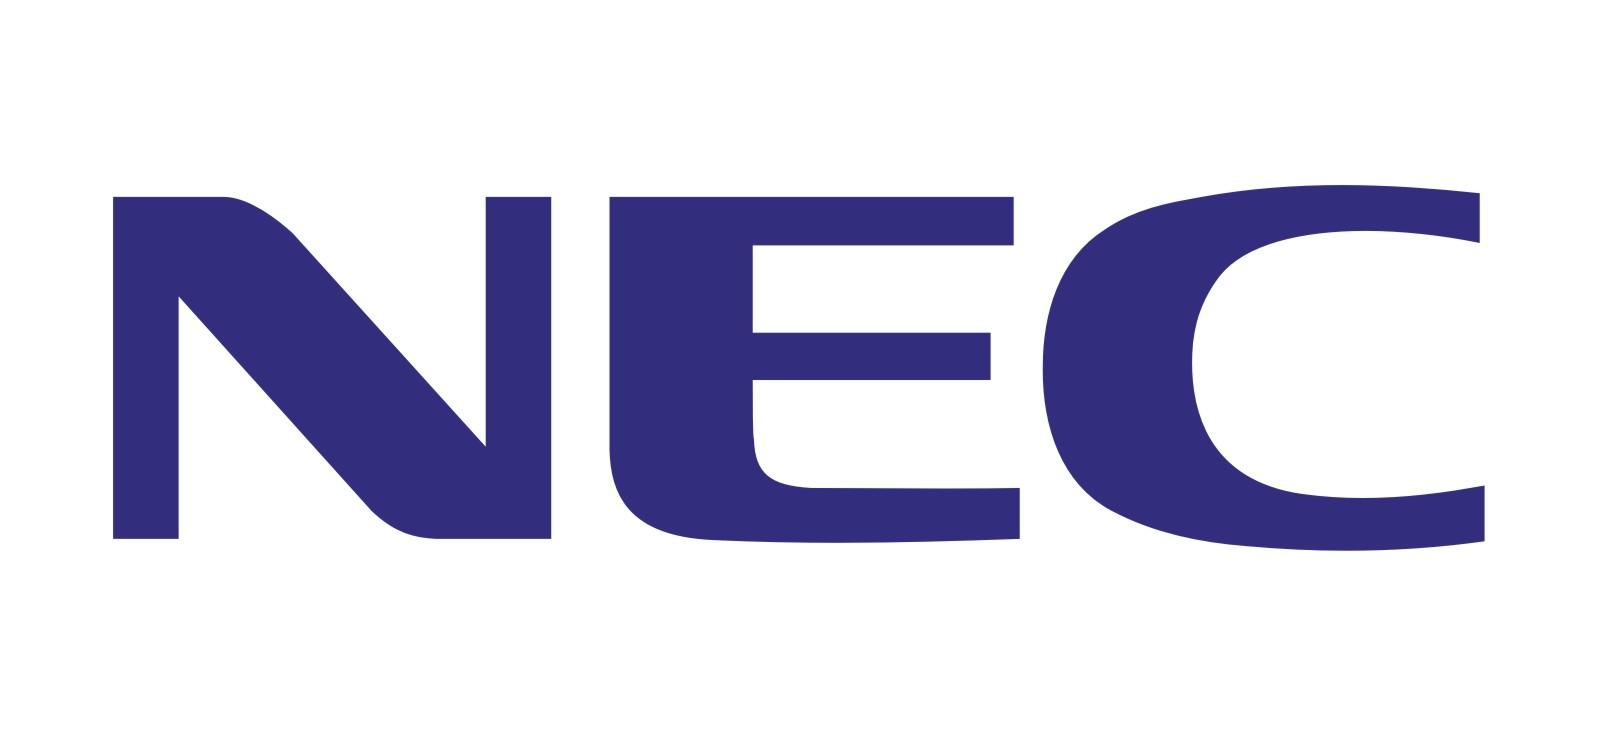 NEC、携帯電話事業から事実上の撤退かーフィーチャーフォンで人気を誇るもスマートフォンが奮わず